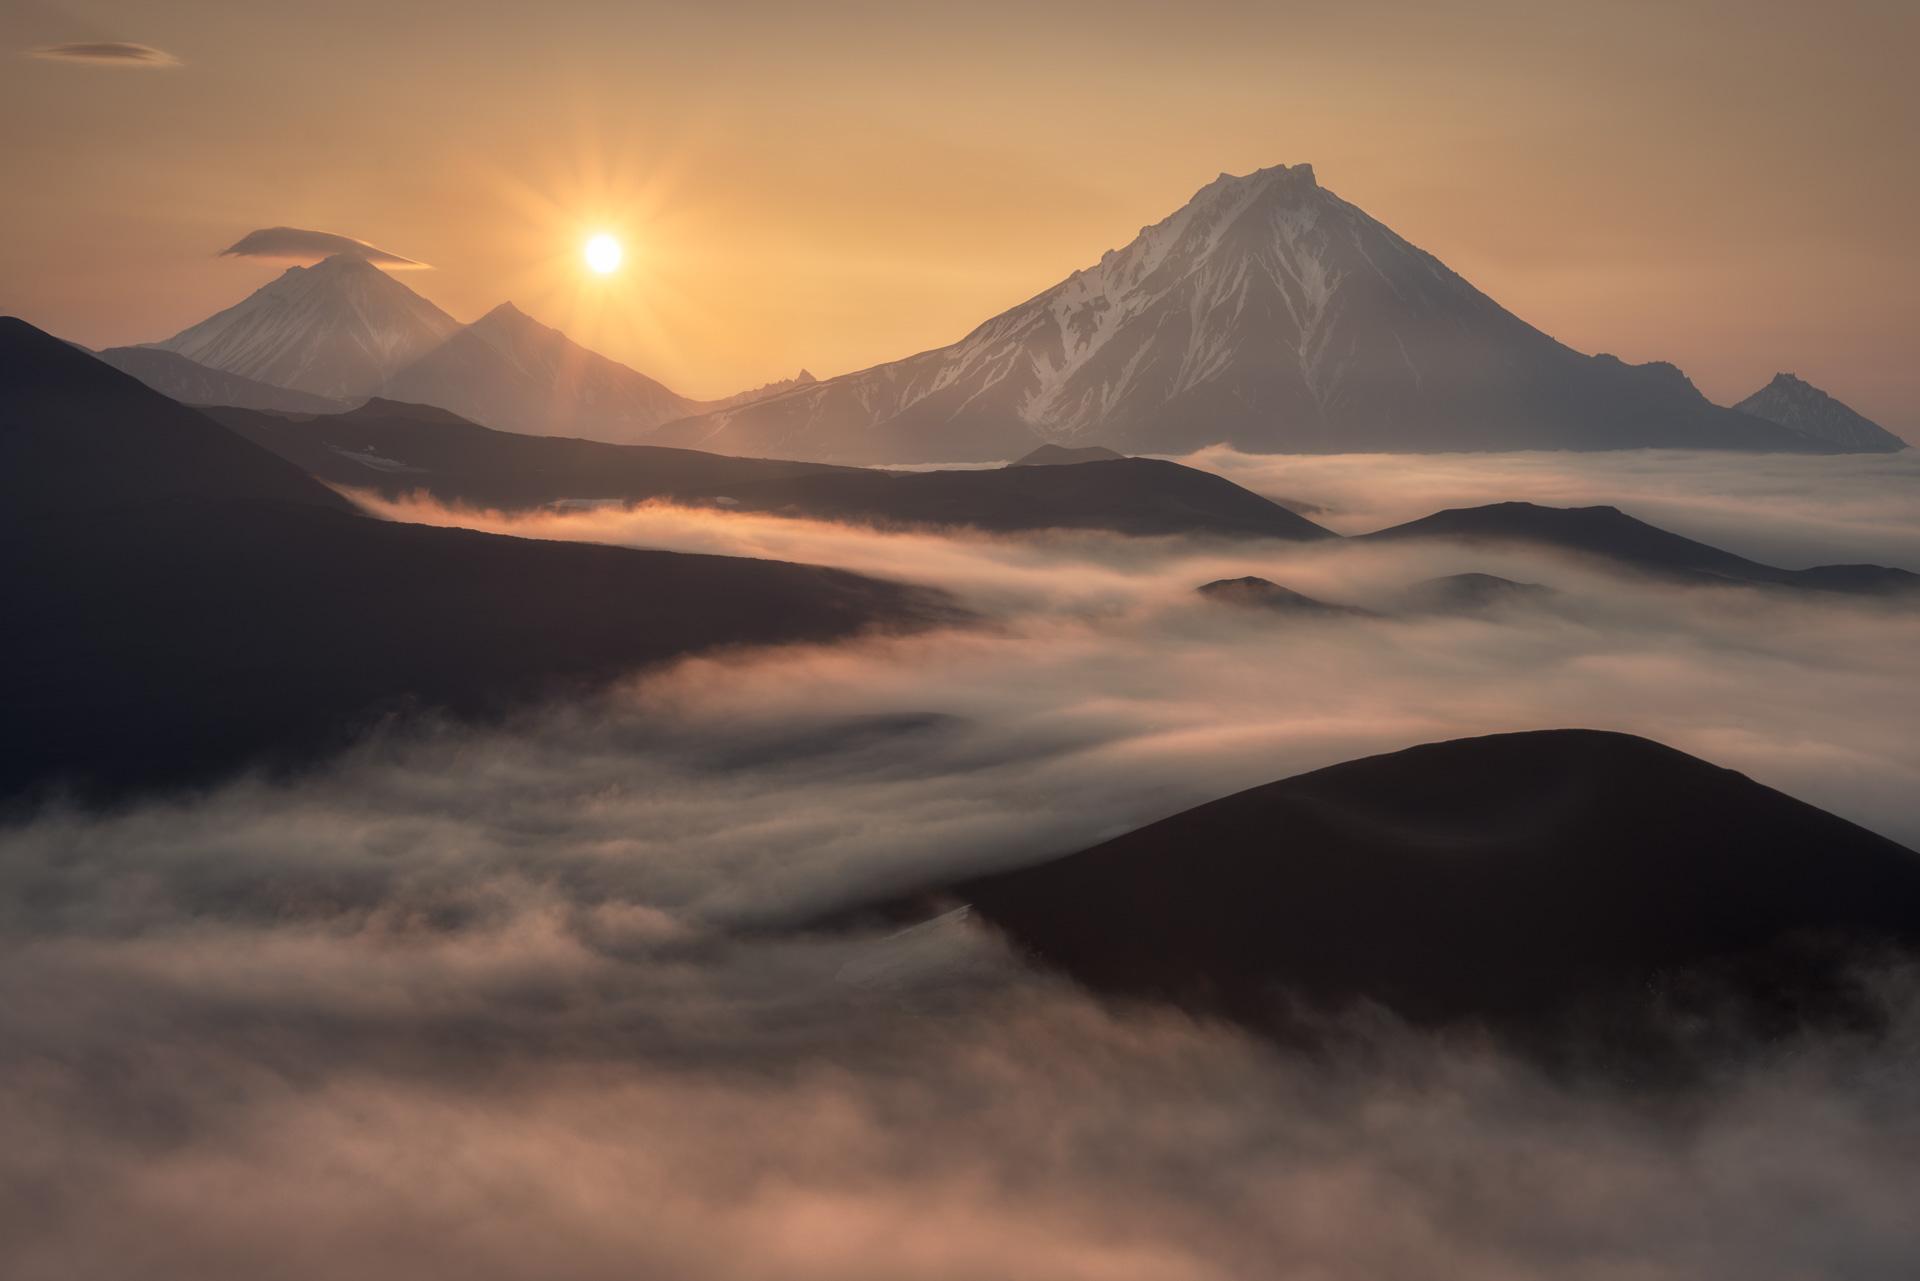 mar de nubes tolbachik kamchatka cono volcanico amanecer fotografia